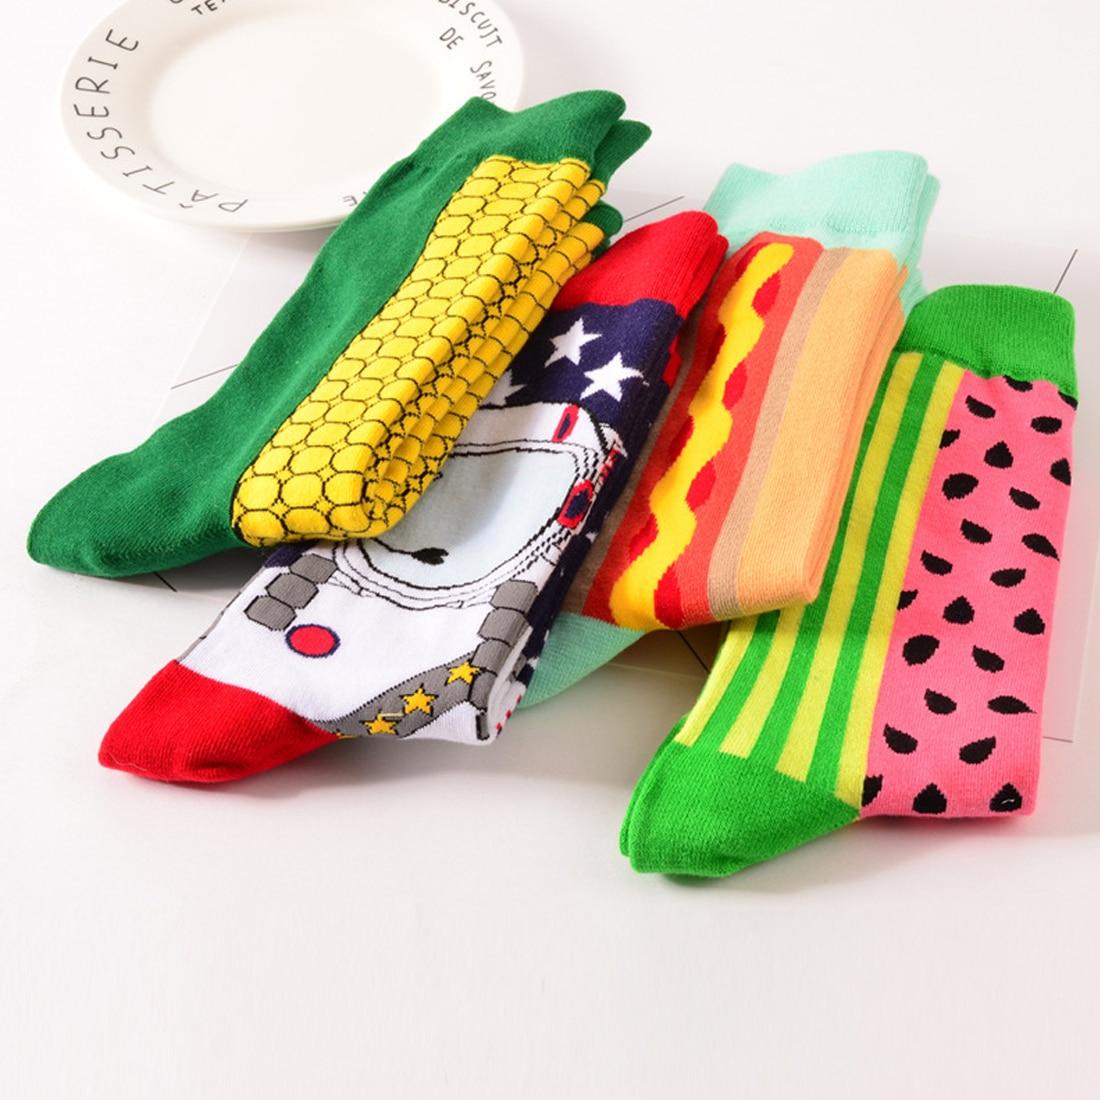 Hot Colour Crew Cotton Happy Socks Men/Women British Style Casual Harajuku Designer Brand Novelty Art For Couple Funny